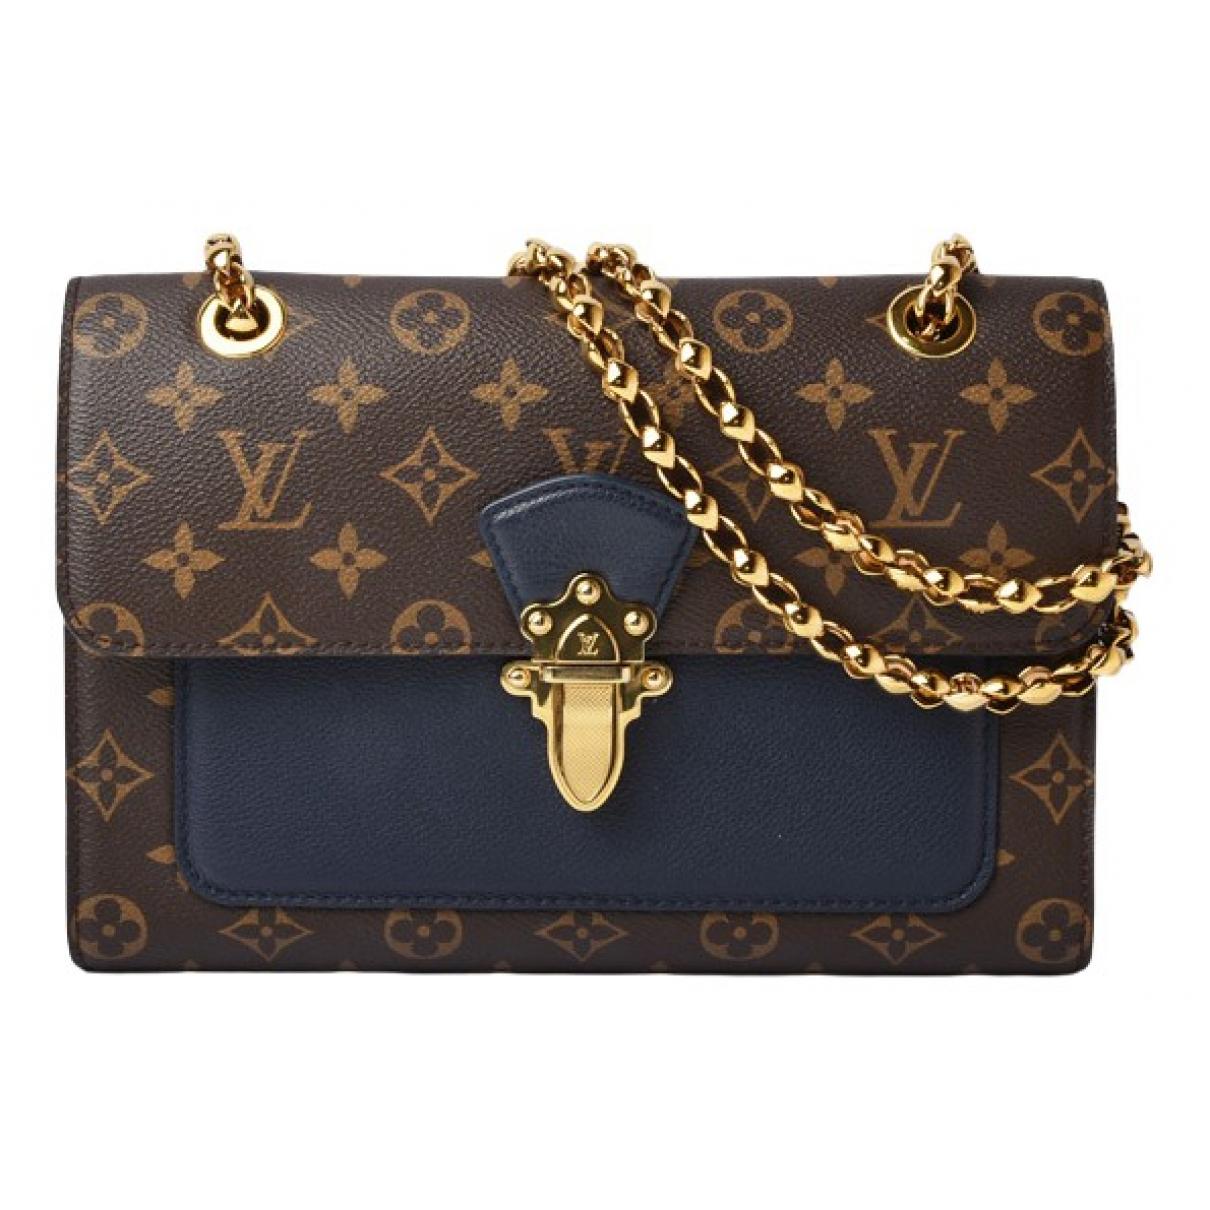 Louis Vuitton Victoire Multicolour Cloth handbag for Women N